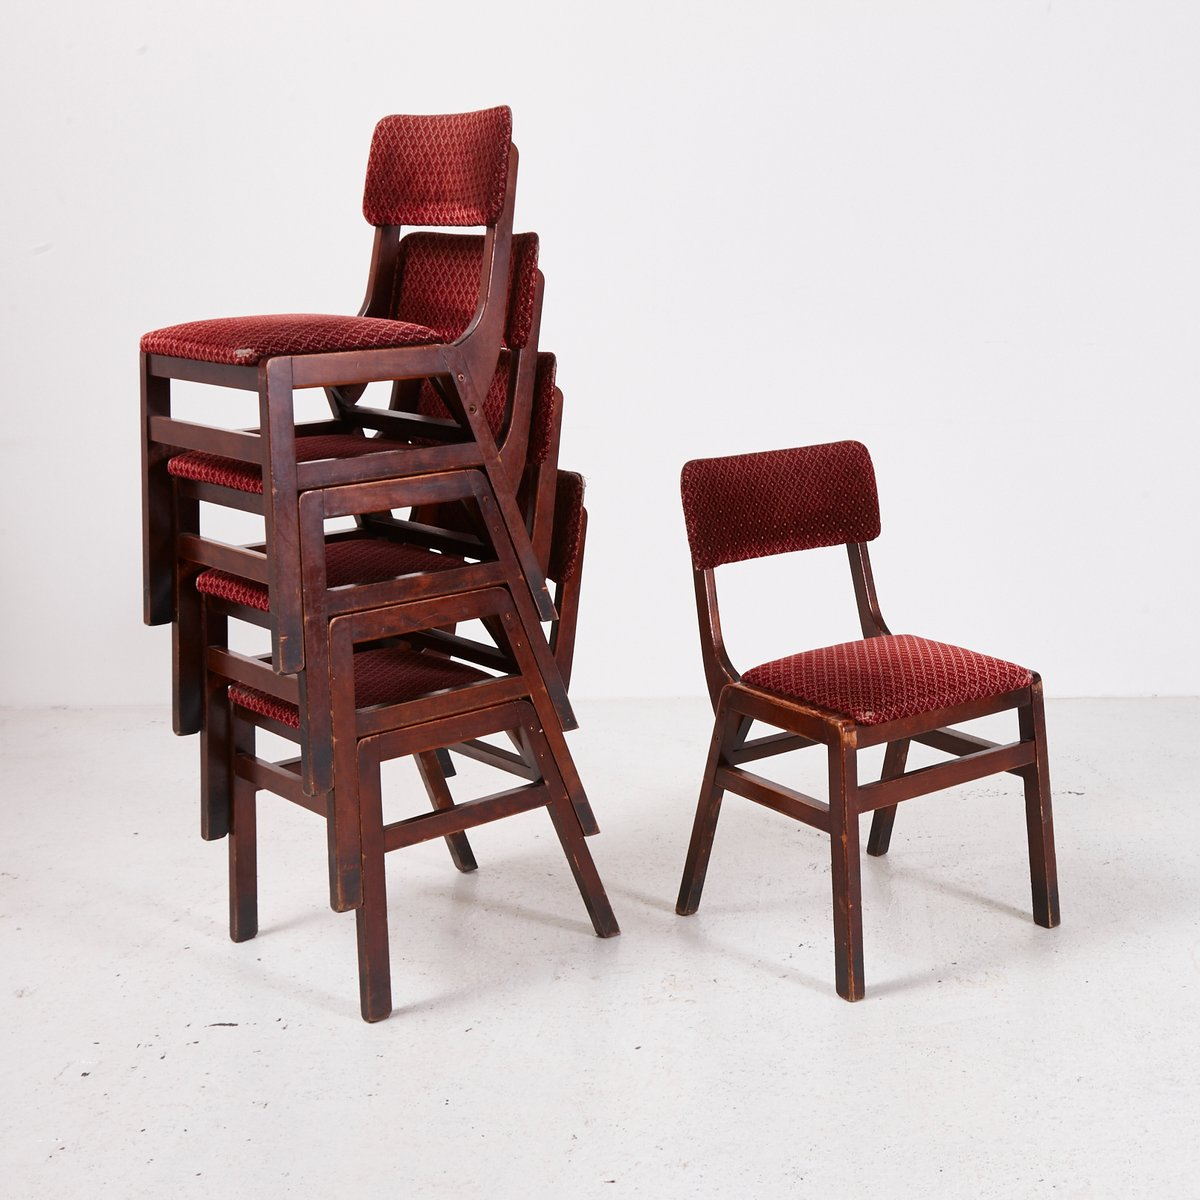 vintage red velvet stackable chair 1970s for sale at pamono. Black Bedroom Furniture Sets. Home Design Ideas